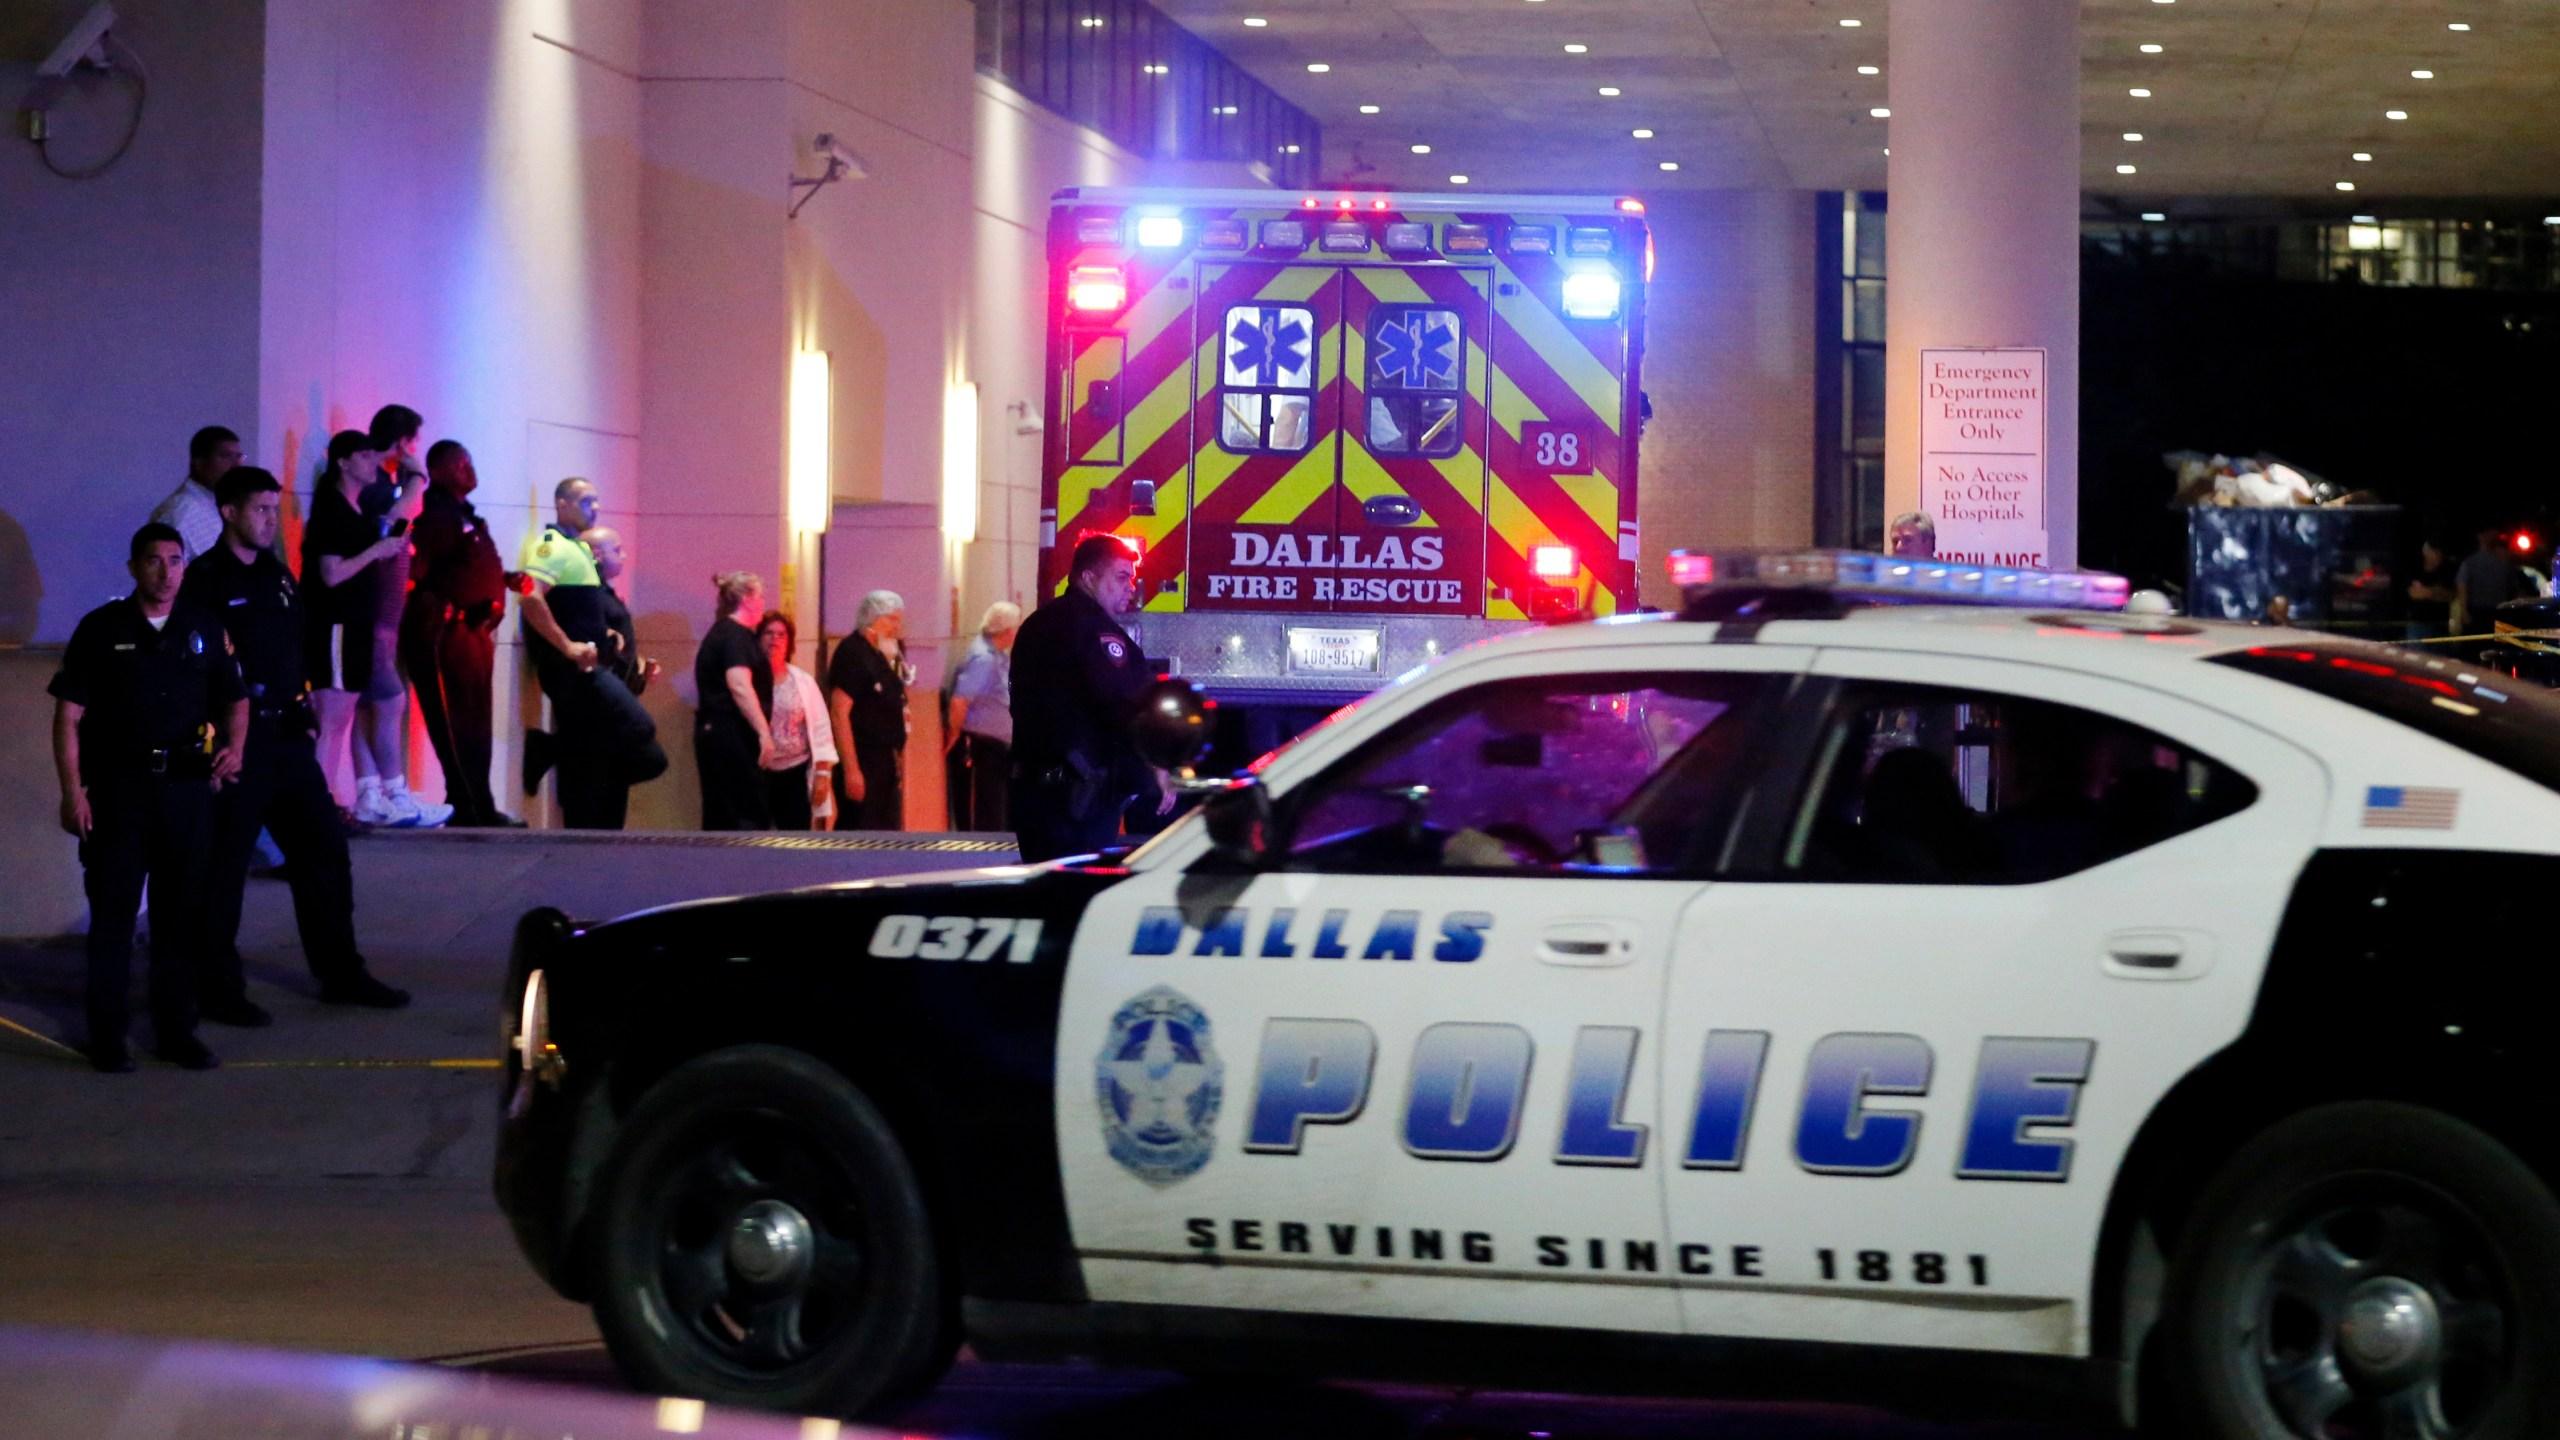 Police Shootings Protests Dallas_309397